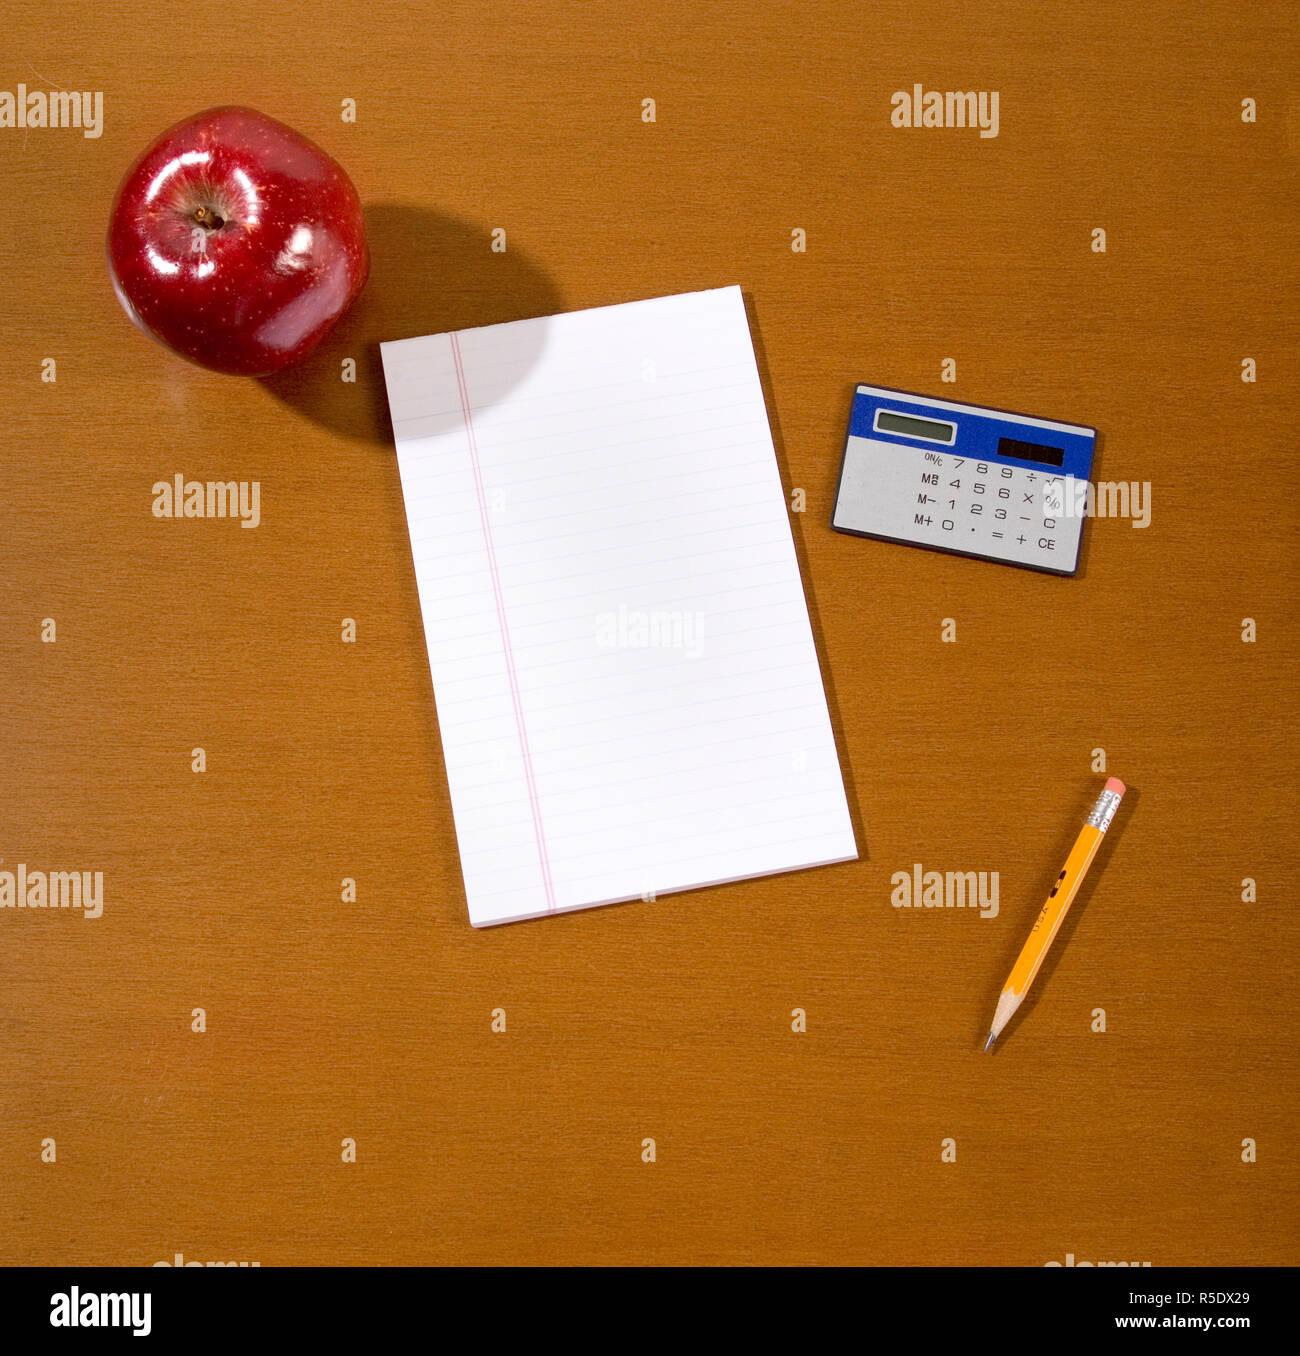 Teachers desk with short pencil, calculator, red apple, pad